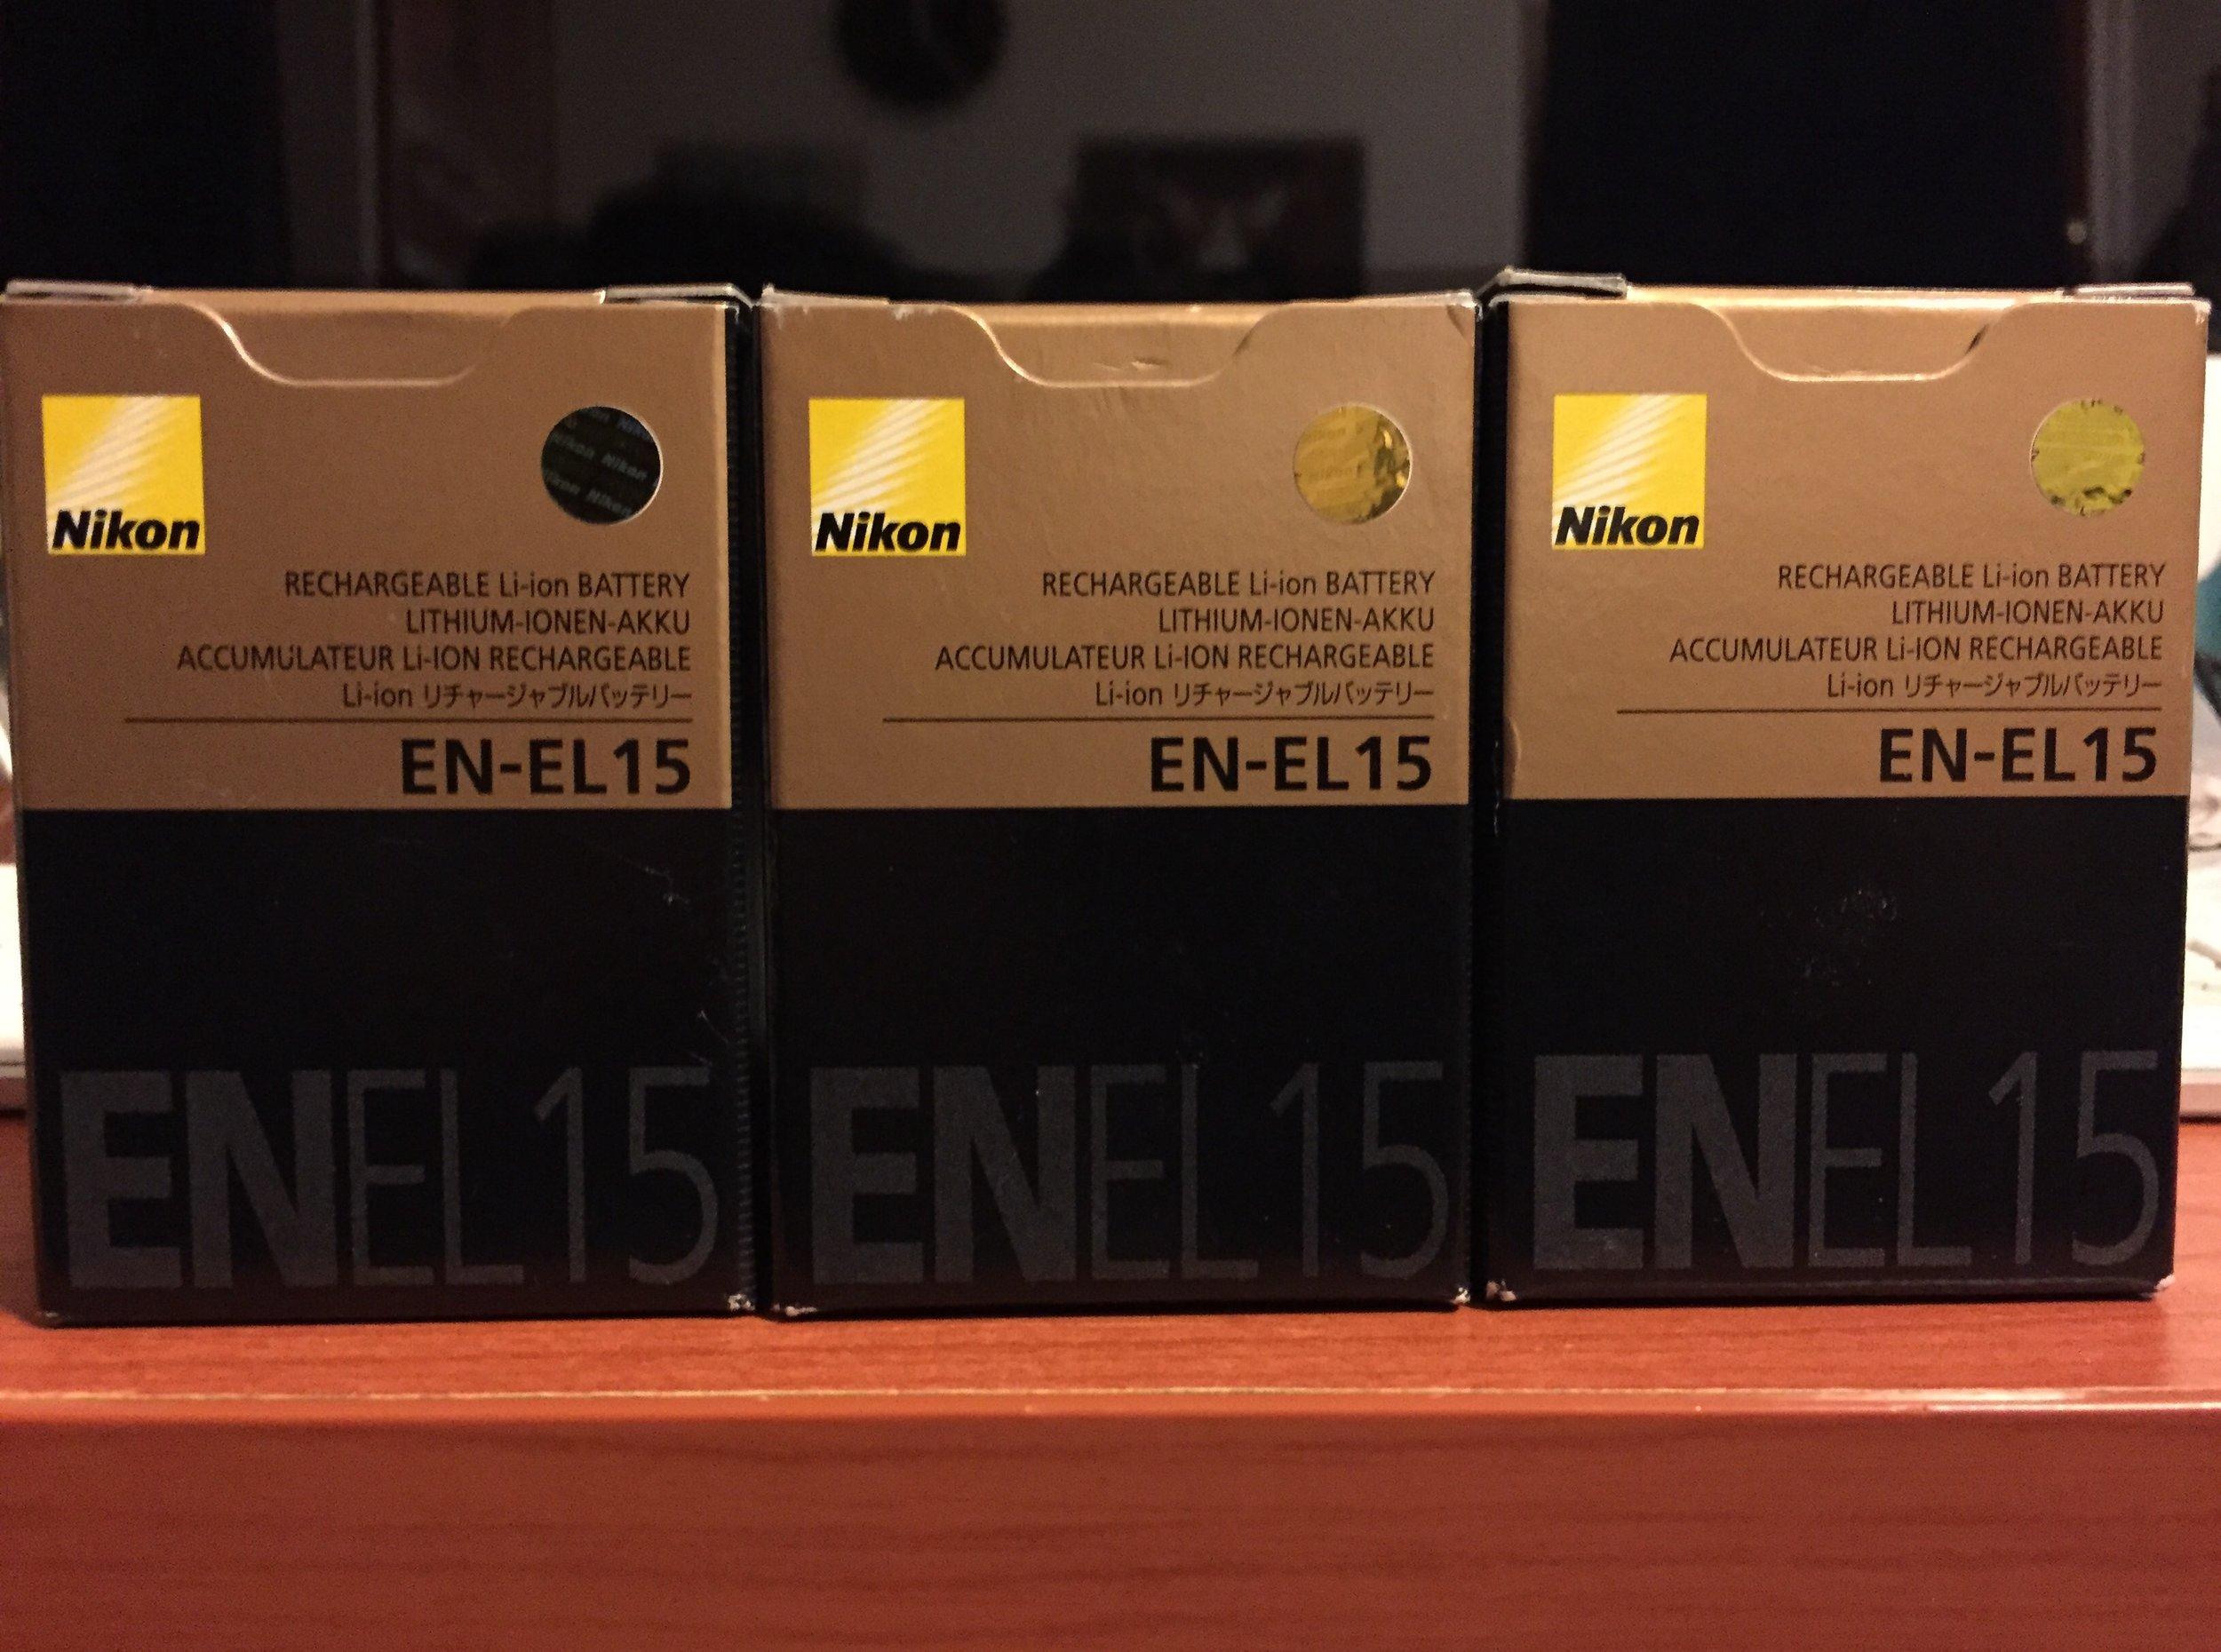 Attrezzatura : Nikon Batteries